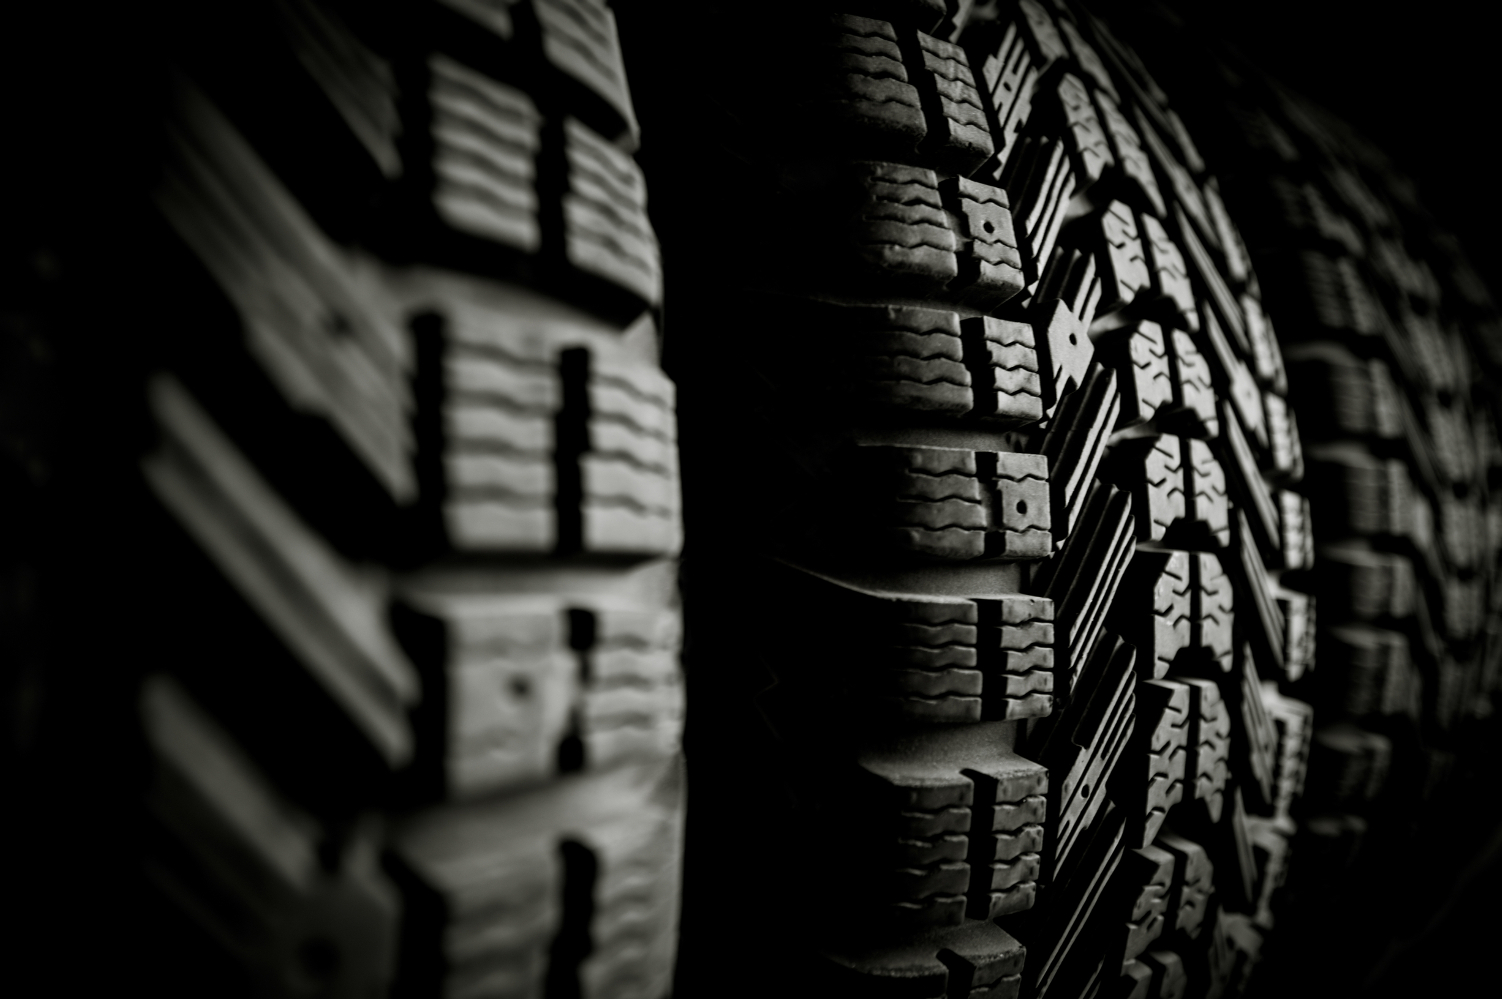 Tire in car service